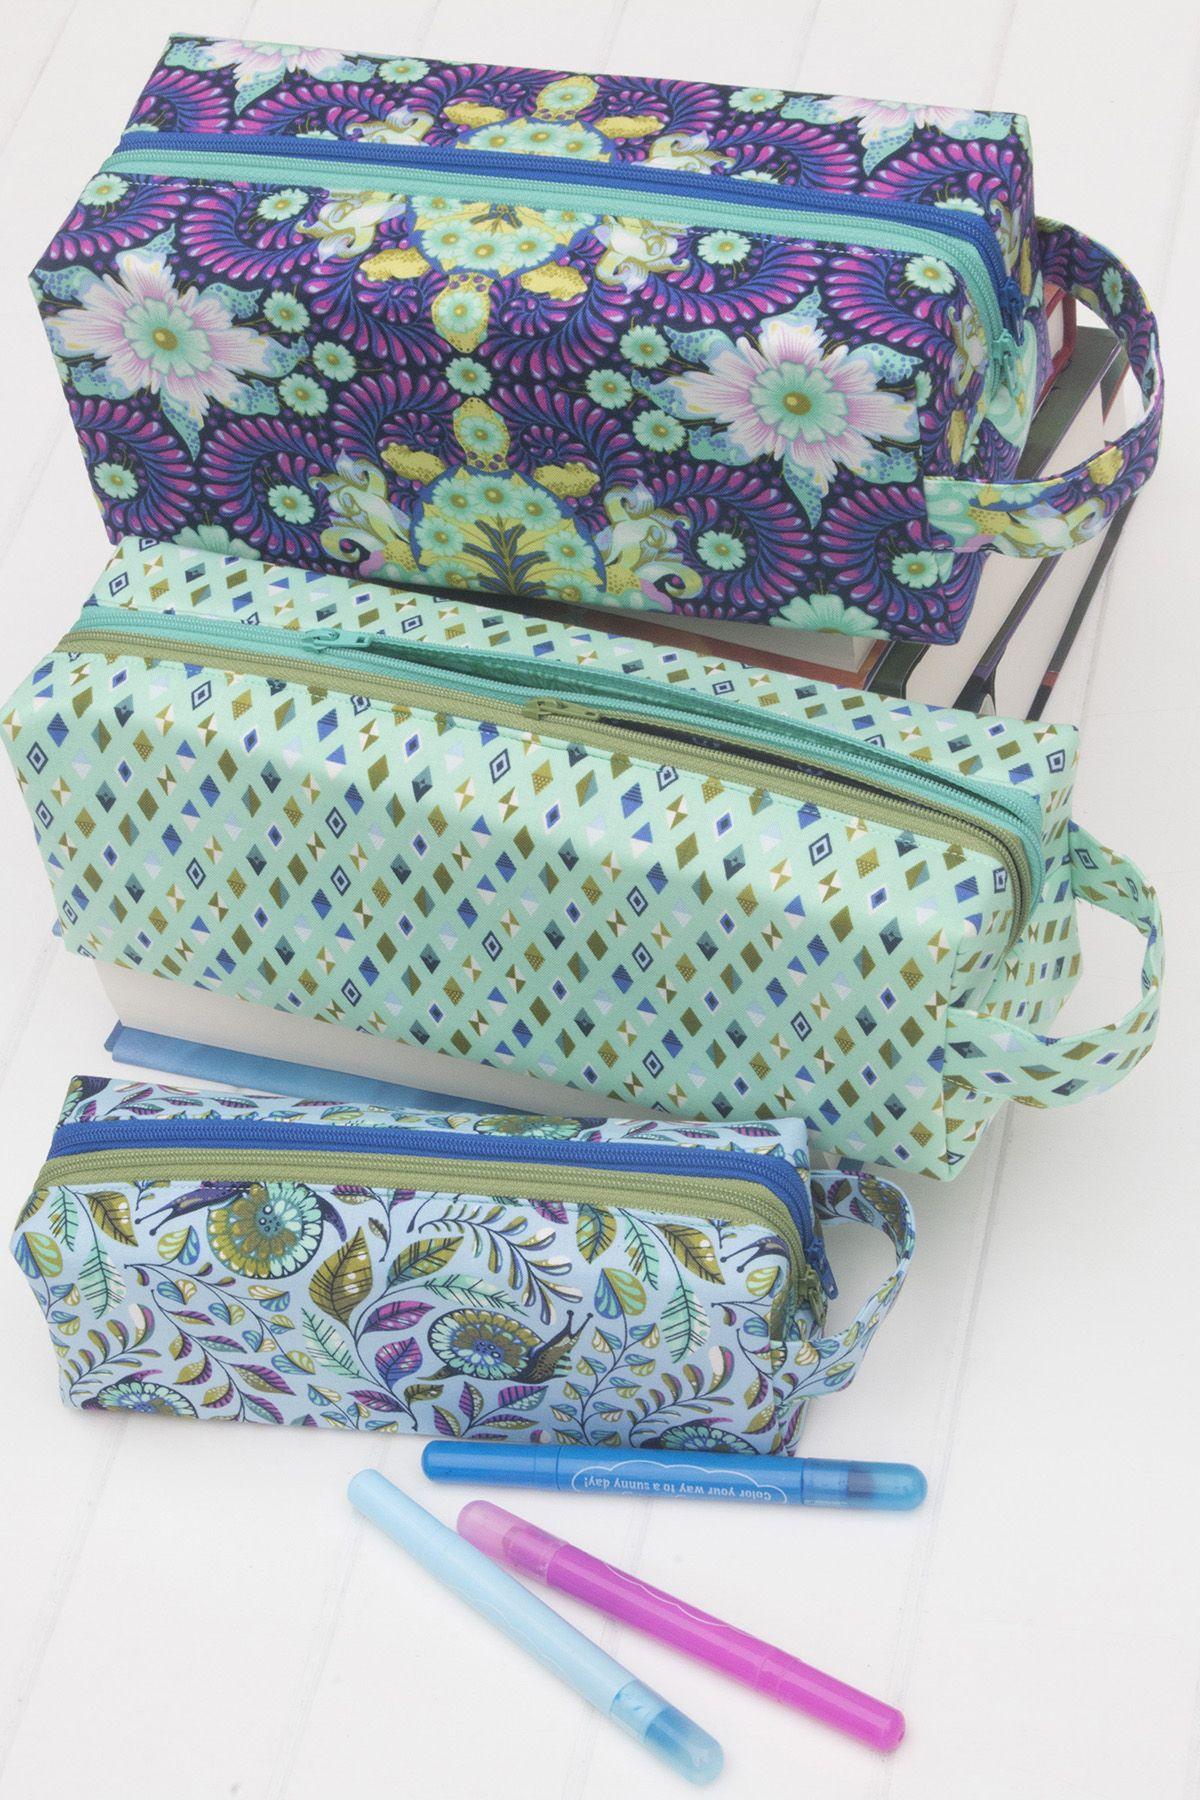 Annex Double Zip Box Pouch Sewing Pinterest Zipper